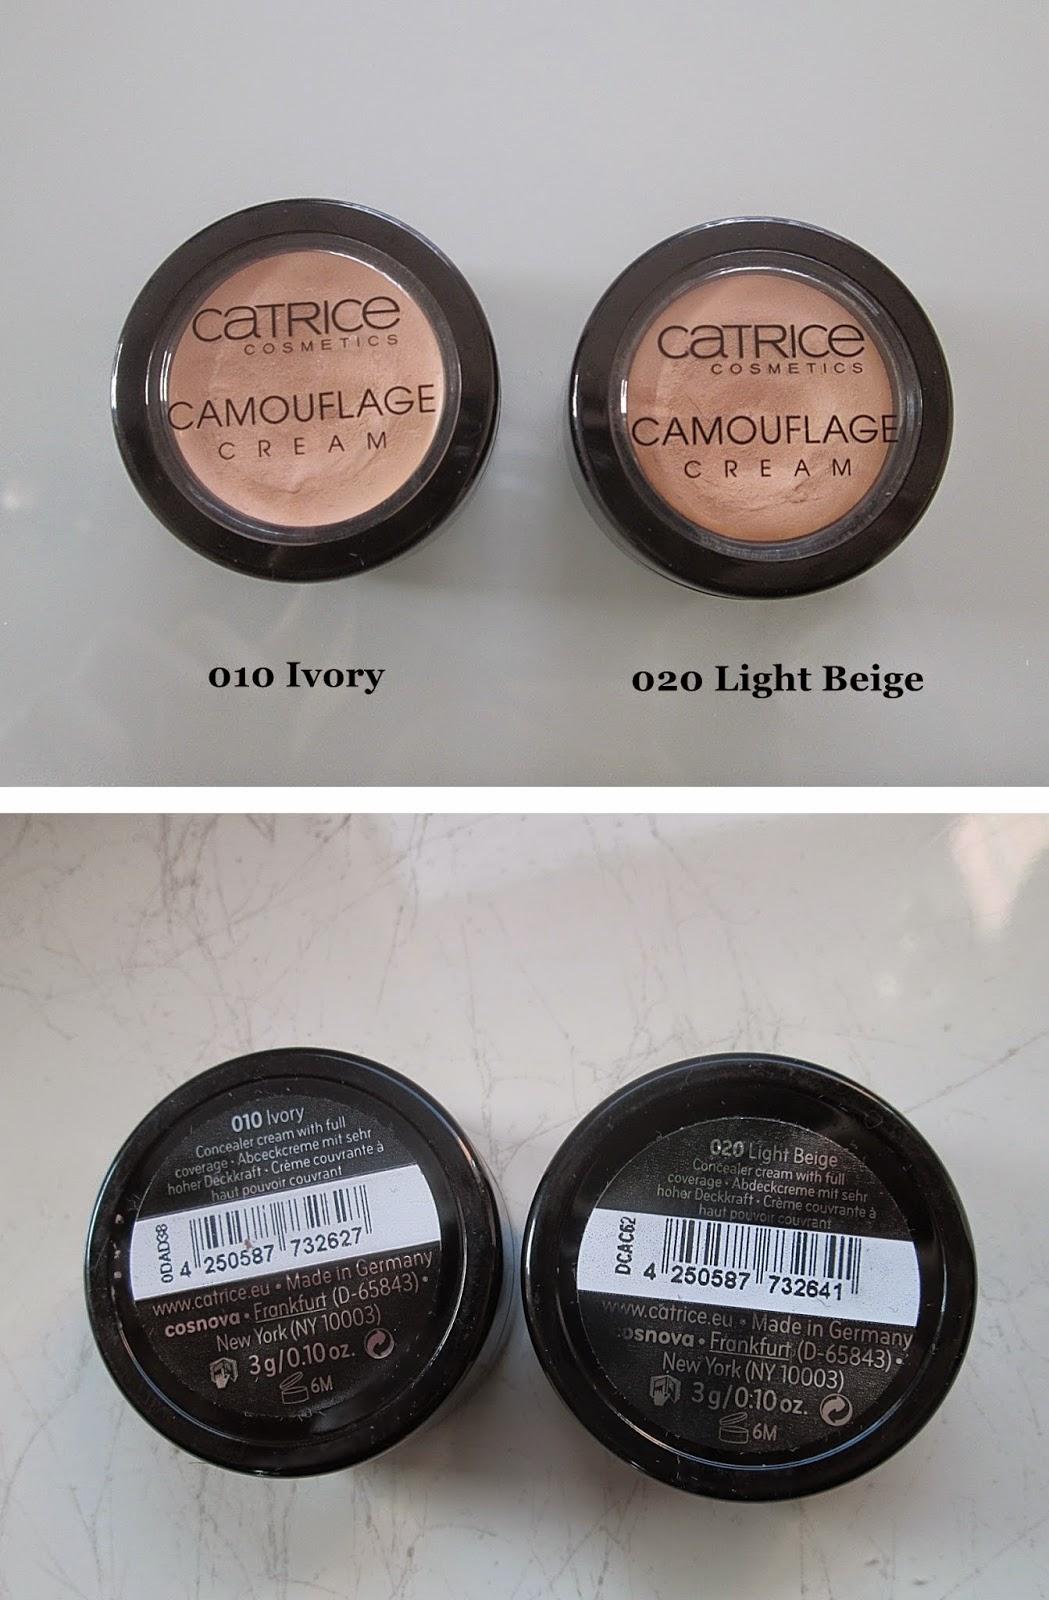 Catrice Camouflage Ivory oraz Catrice Camouflage Light Beige